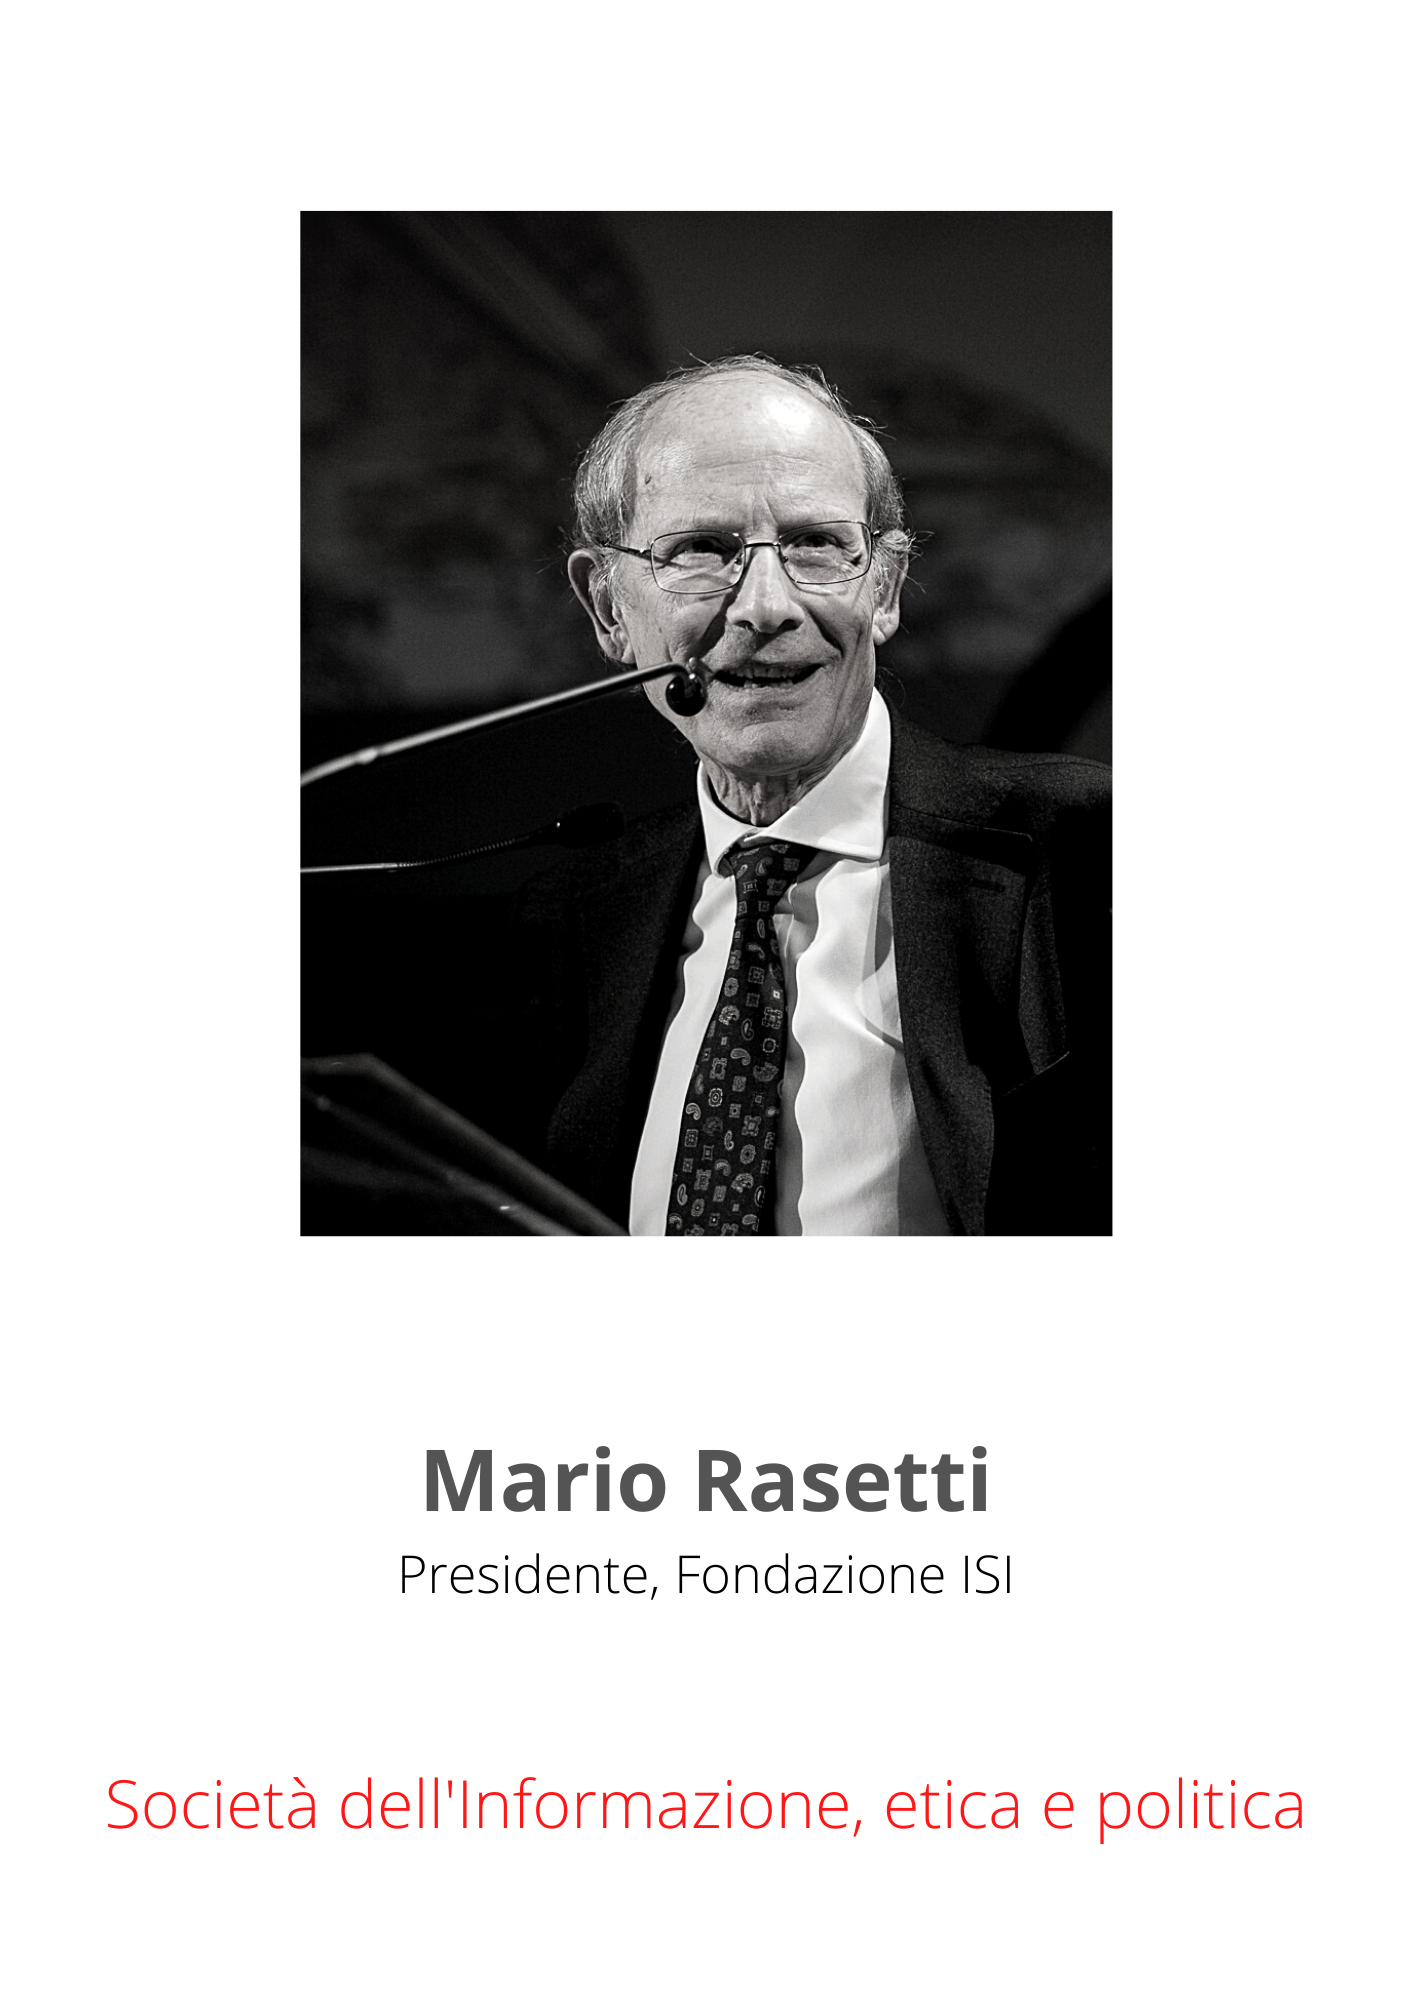 Mario Rasetti